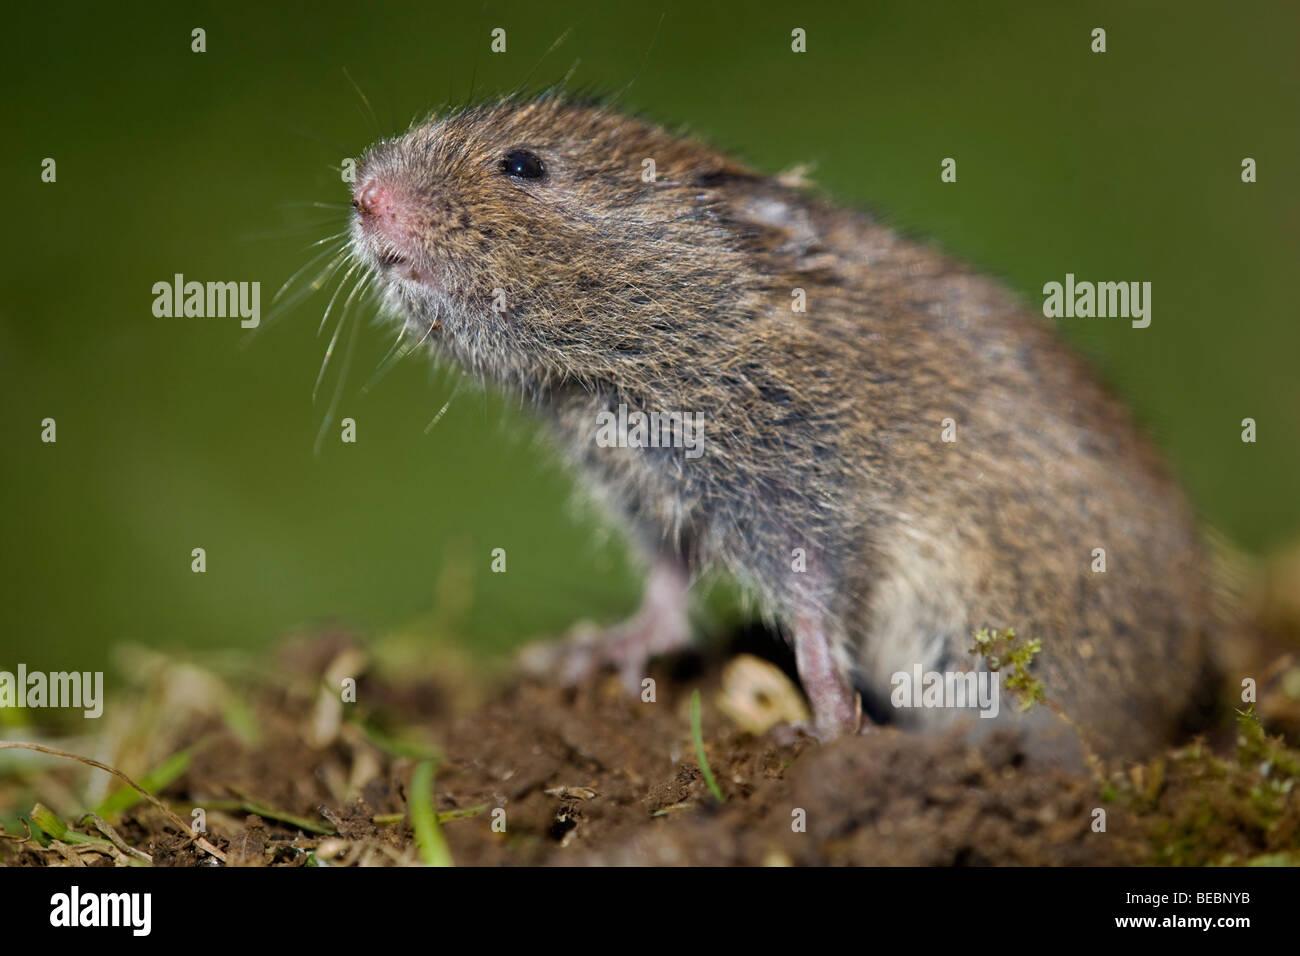 field vole; Microtus agrestis; - Stock Image